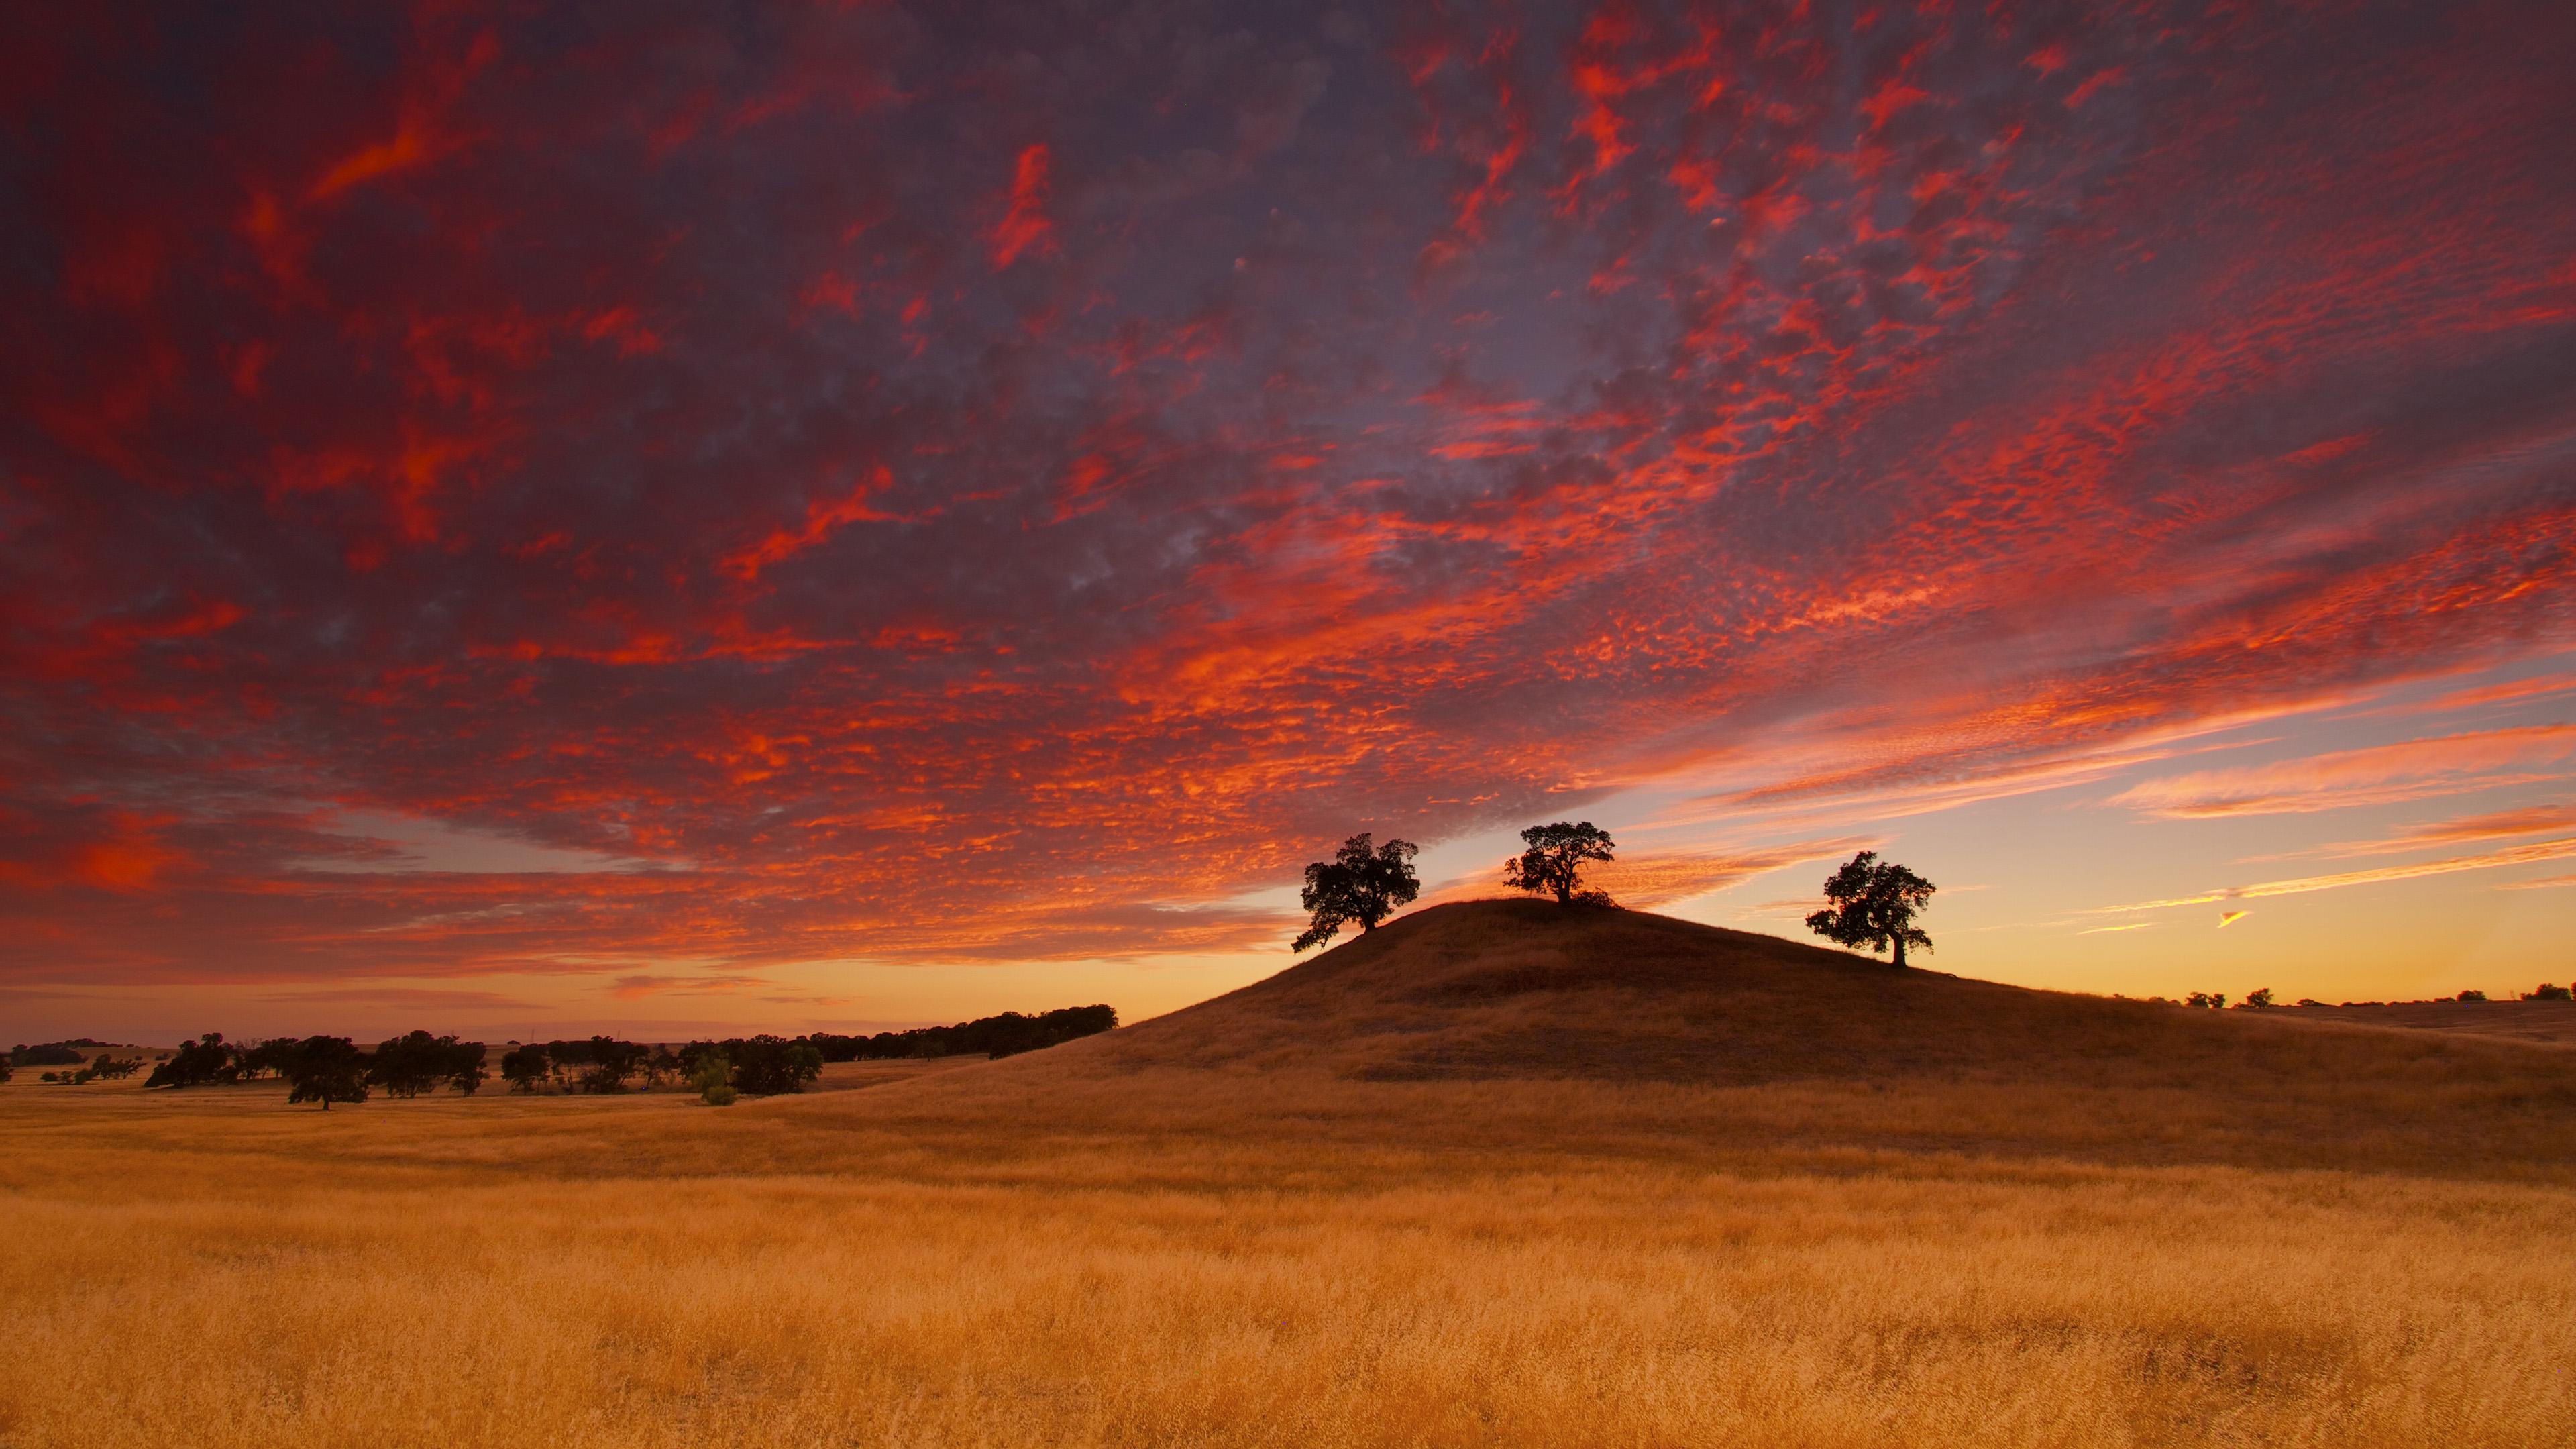 Sunset 4k Ultra HD Wallpaper | Background Image ...